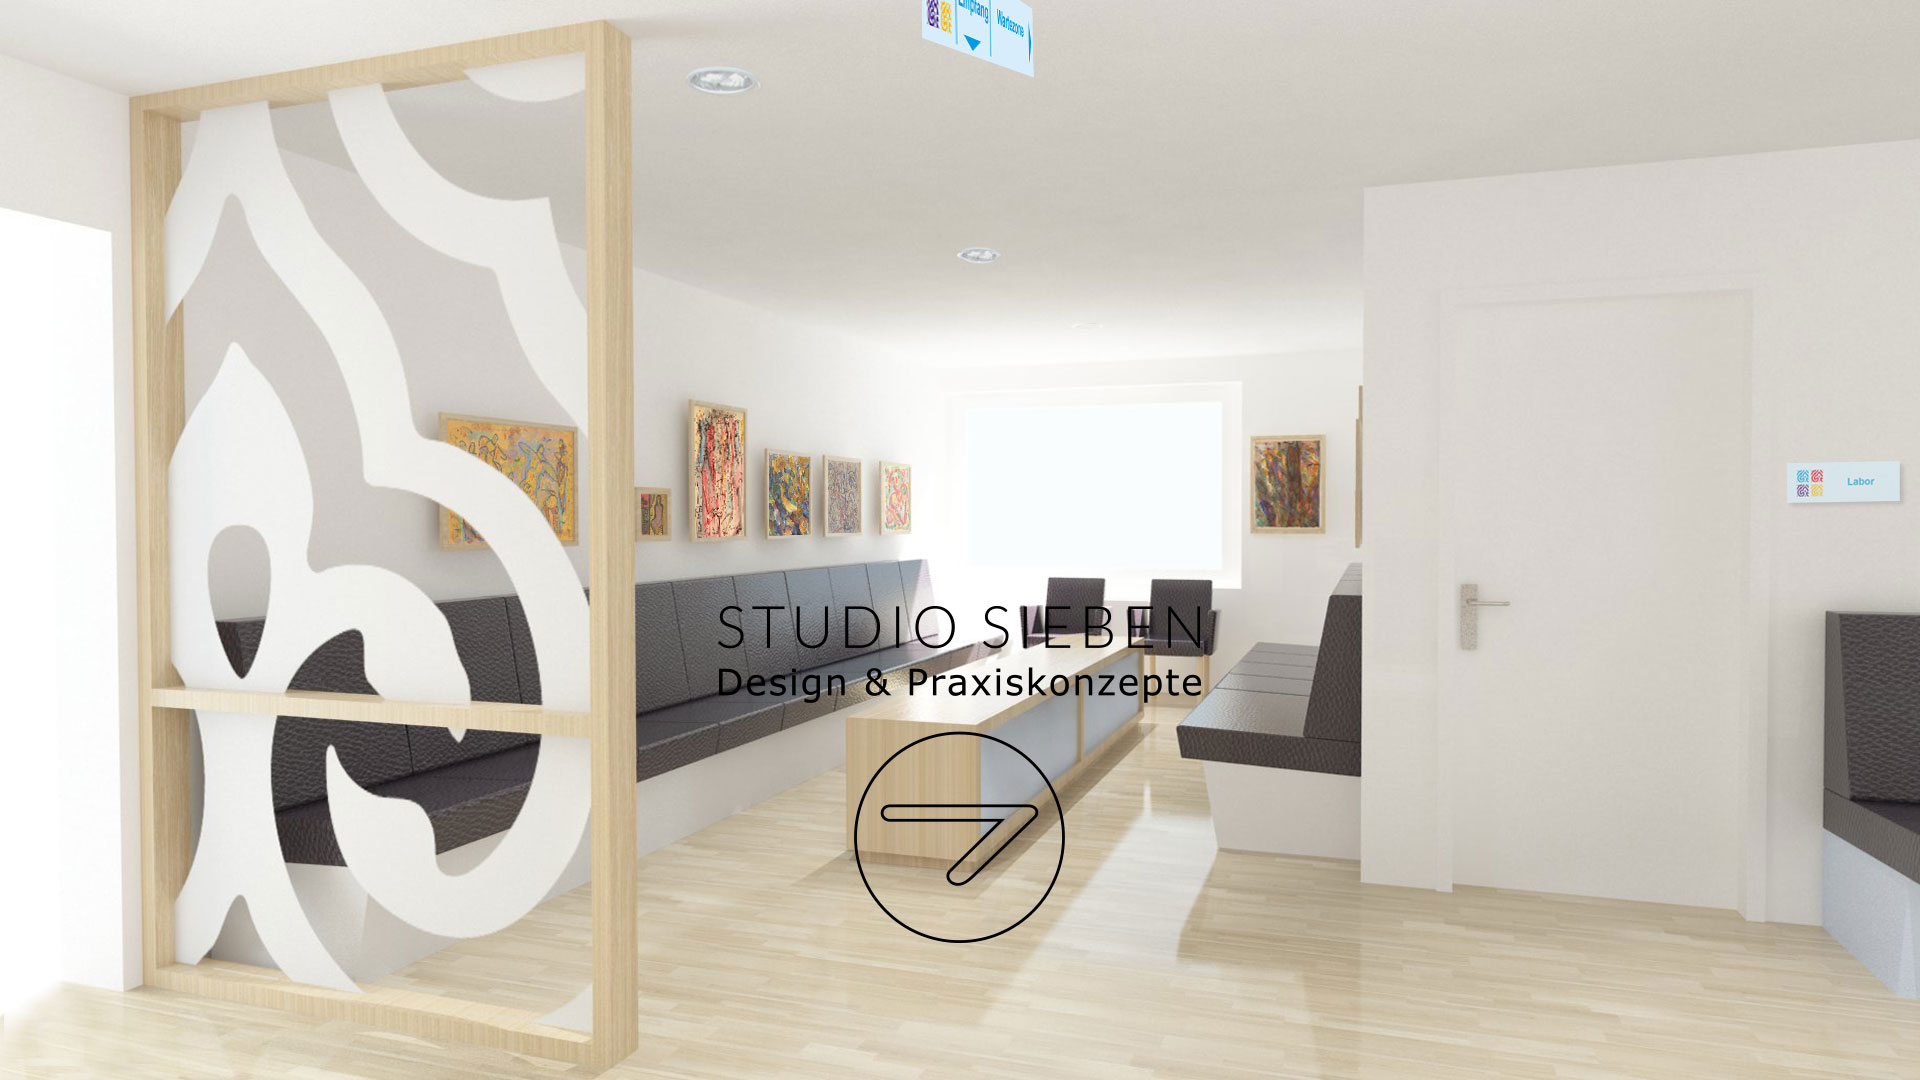 praxis haz duisburg inneneinrichtung 01 studio 7 hamburg. Black Bedroom Furniture Sets. Home Design Ideas